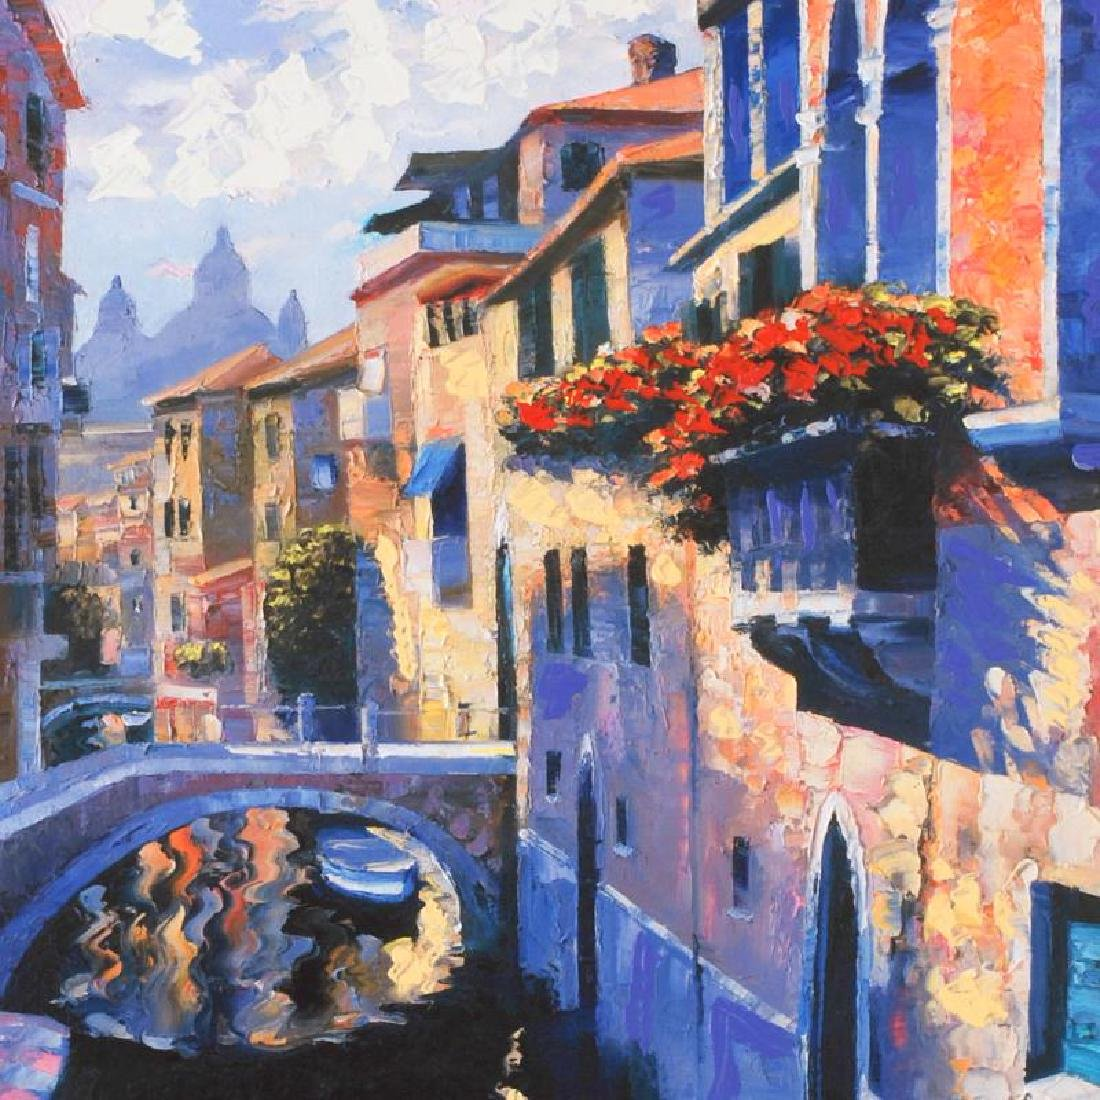 Magic of Venice III by Behrens (1933-2014) - 2